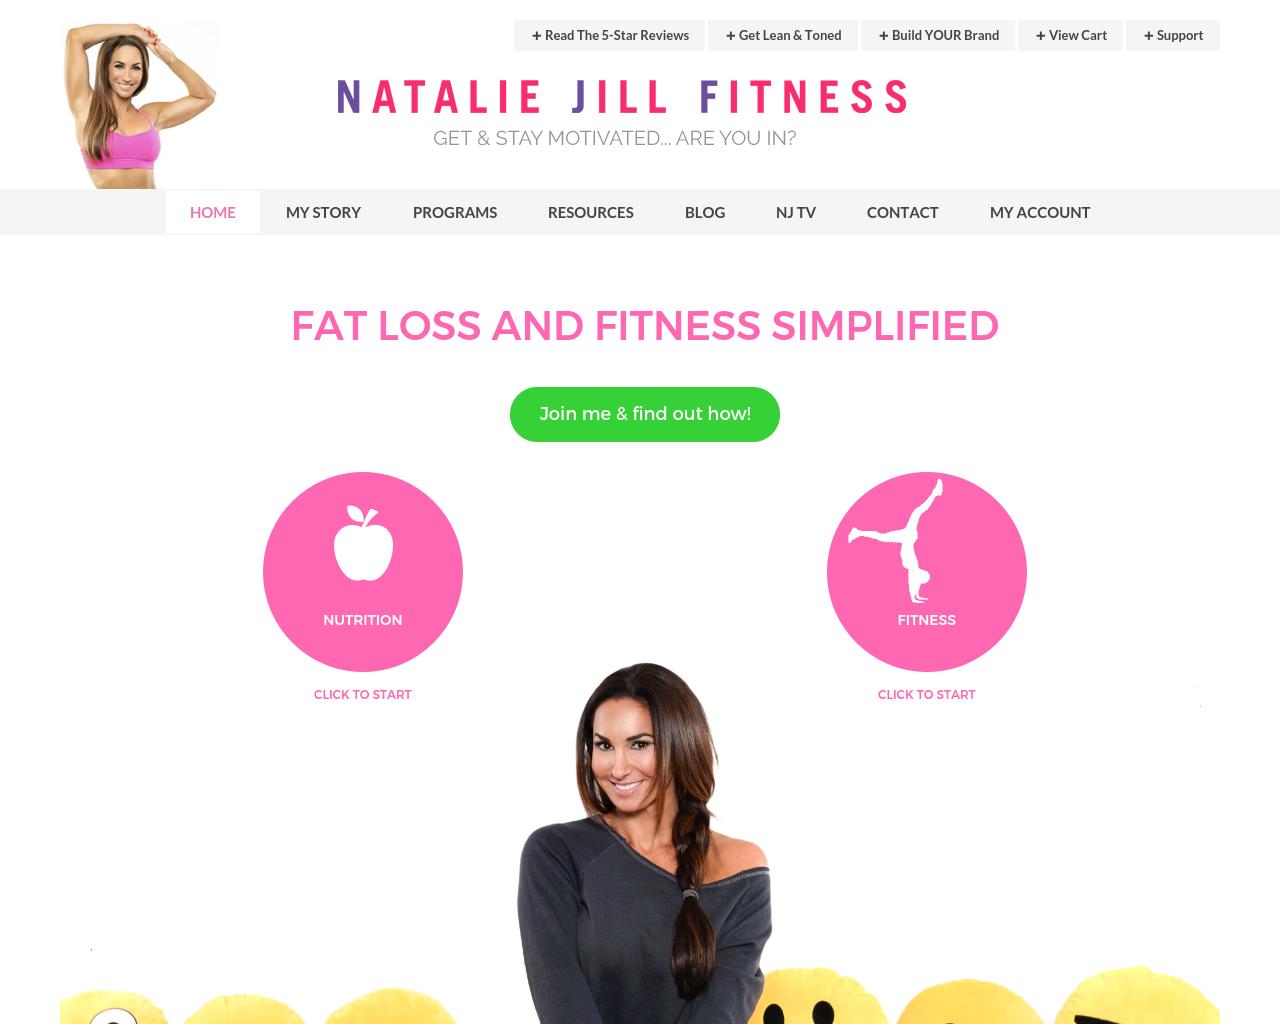 Natalie-Jill-Fitness-Advertising-Reviews-Pricing